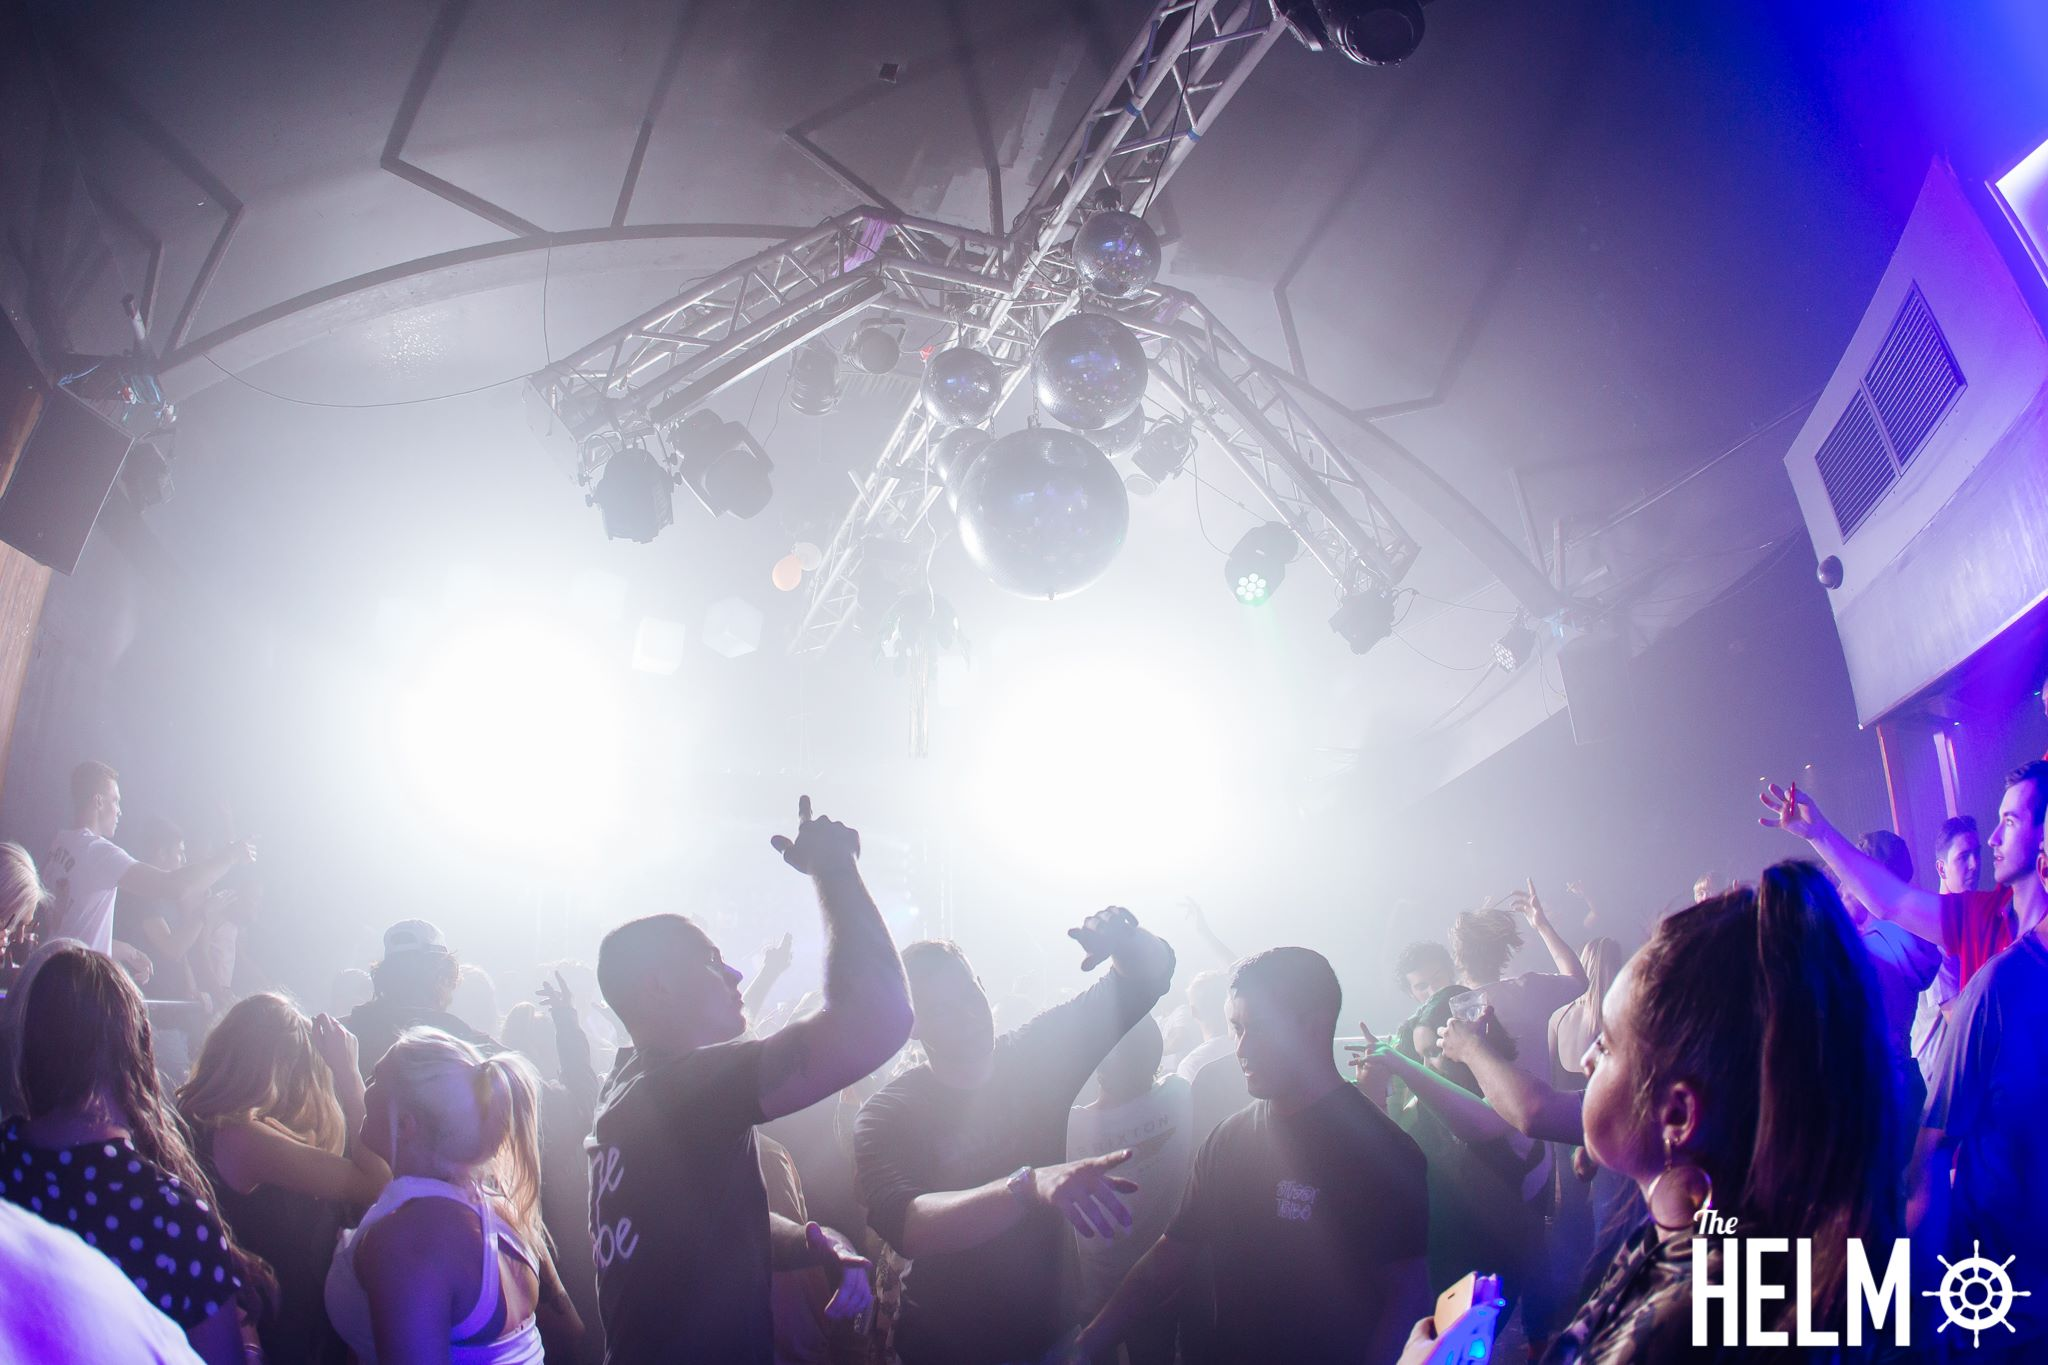 Helm nightclub in Mooloolaba